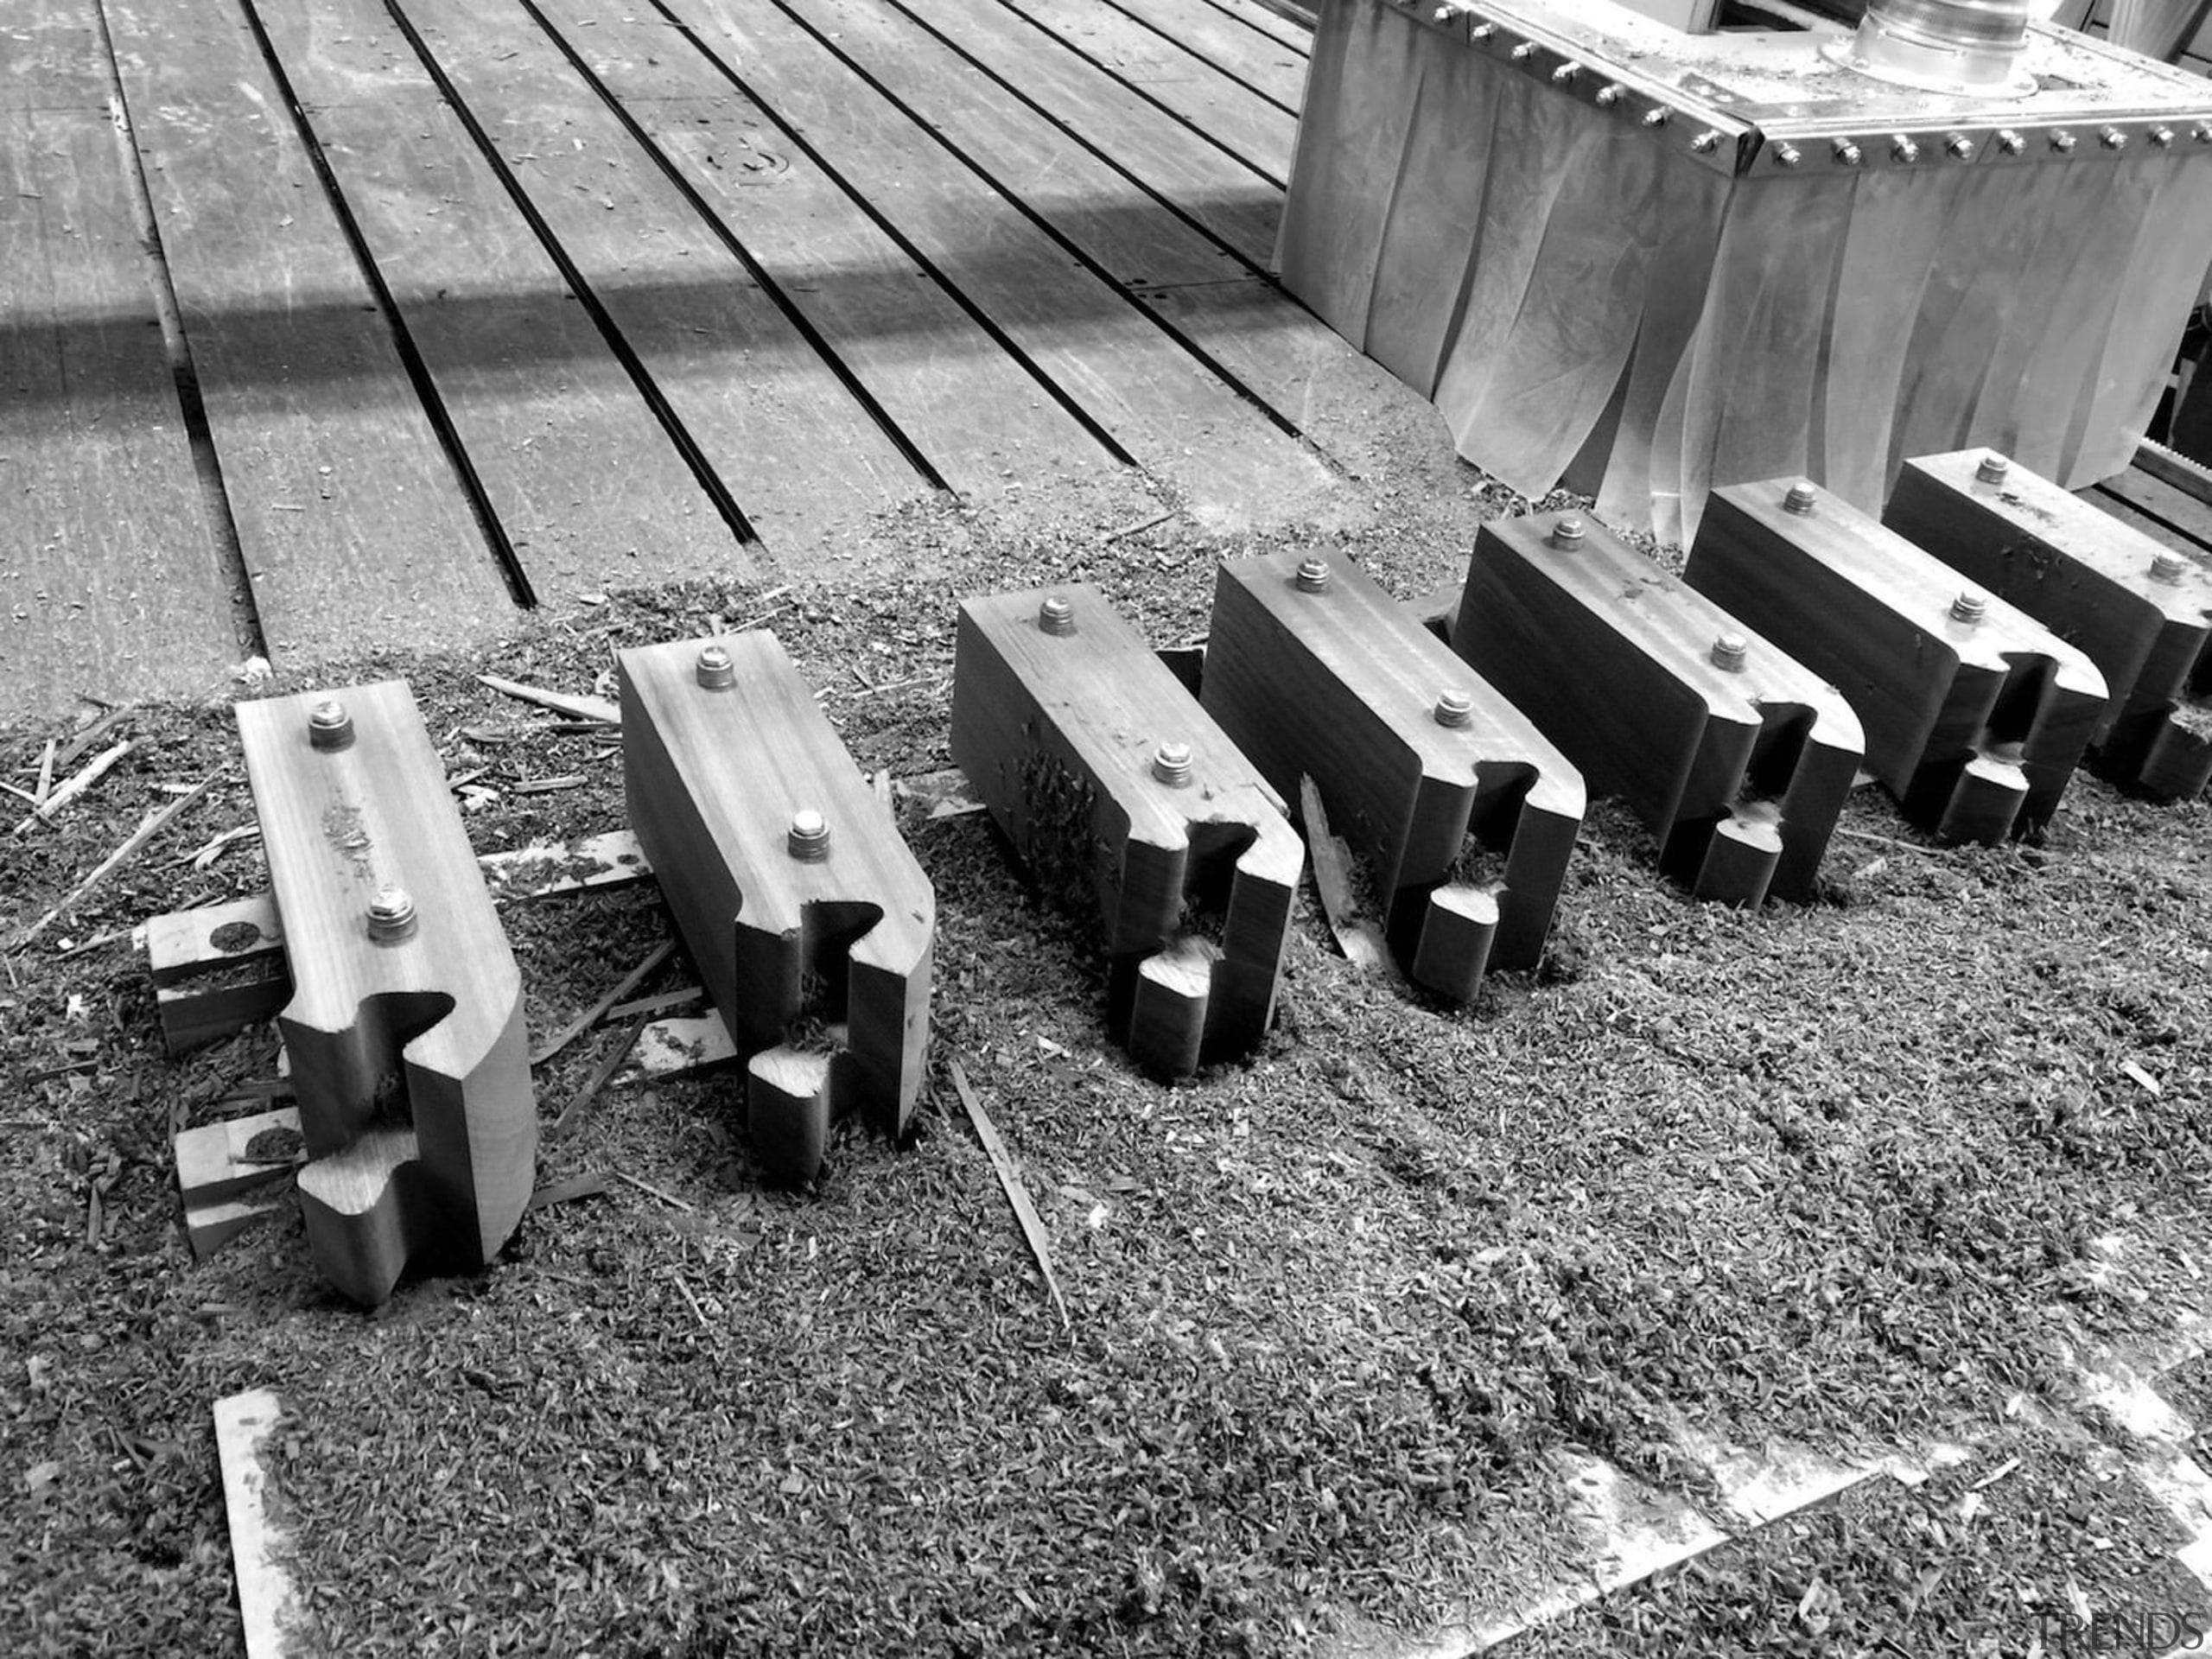 Architect: J.Roc Design black and white, line, metal, monochrome, monochrome photography, wood, gray, black